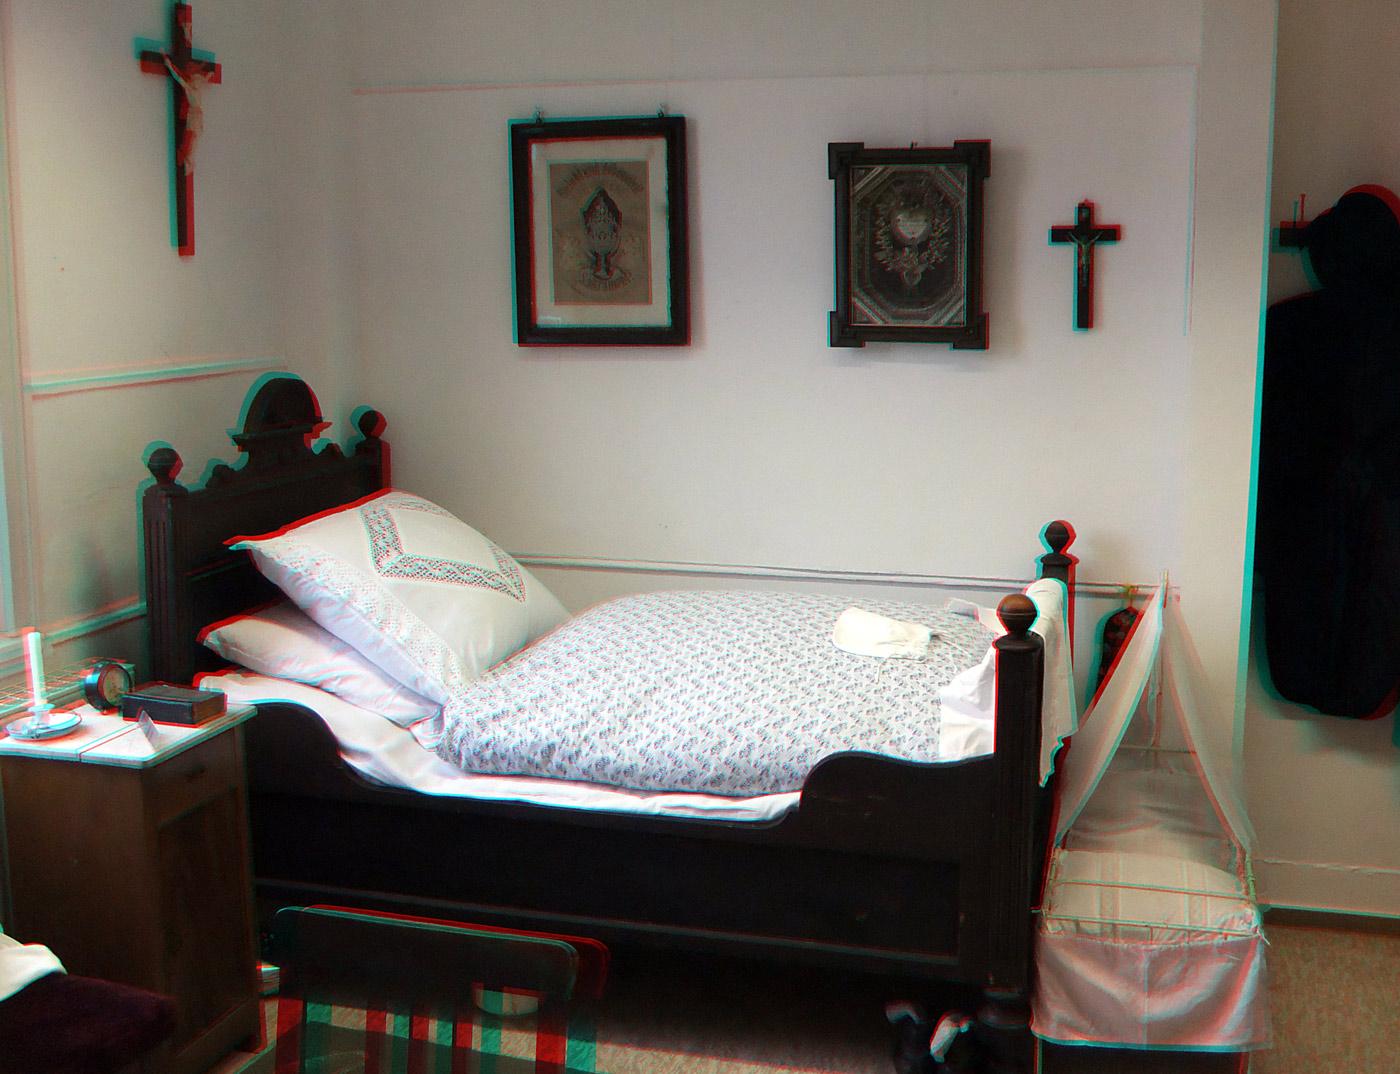 Full Size of Altes Bett Bentigt Ein Tool Aus Dem Letzten Bild Foto 140x200 Betten 200x220 2x2m Kolonialstil 220 X Mit Unterbett Flach 140 100x200 Günstig Paidi 180x200 Bett Altes Bett